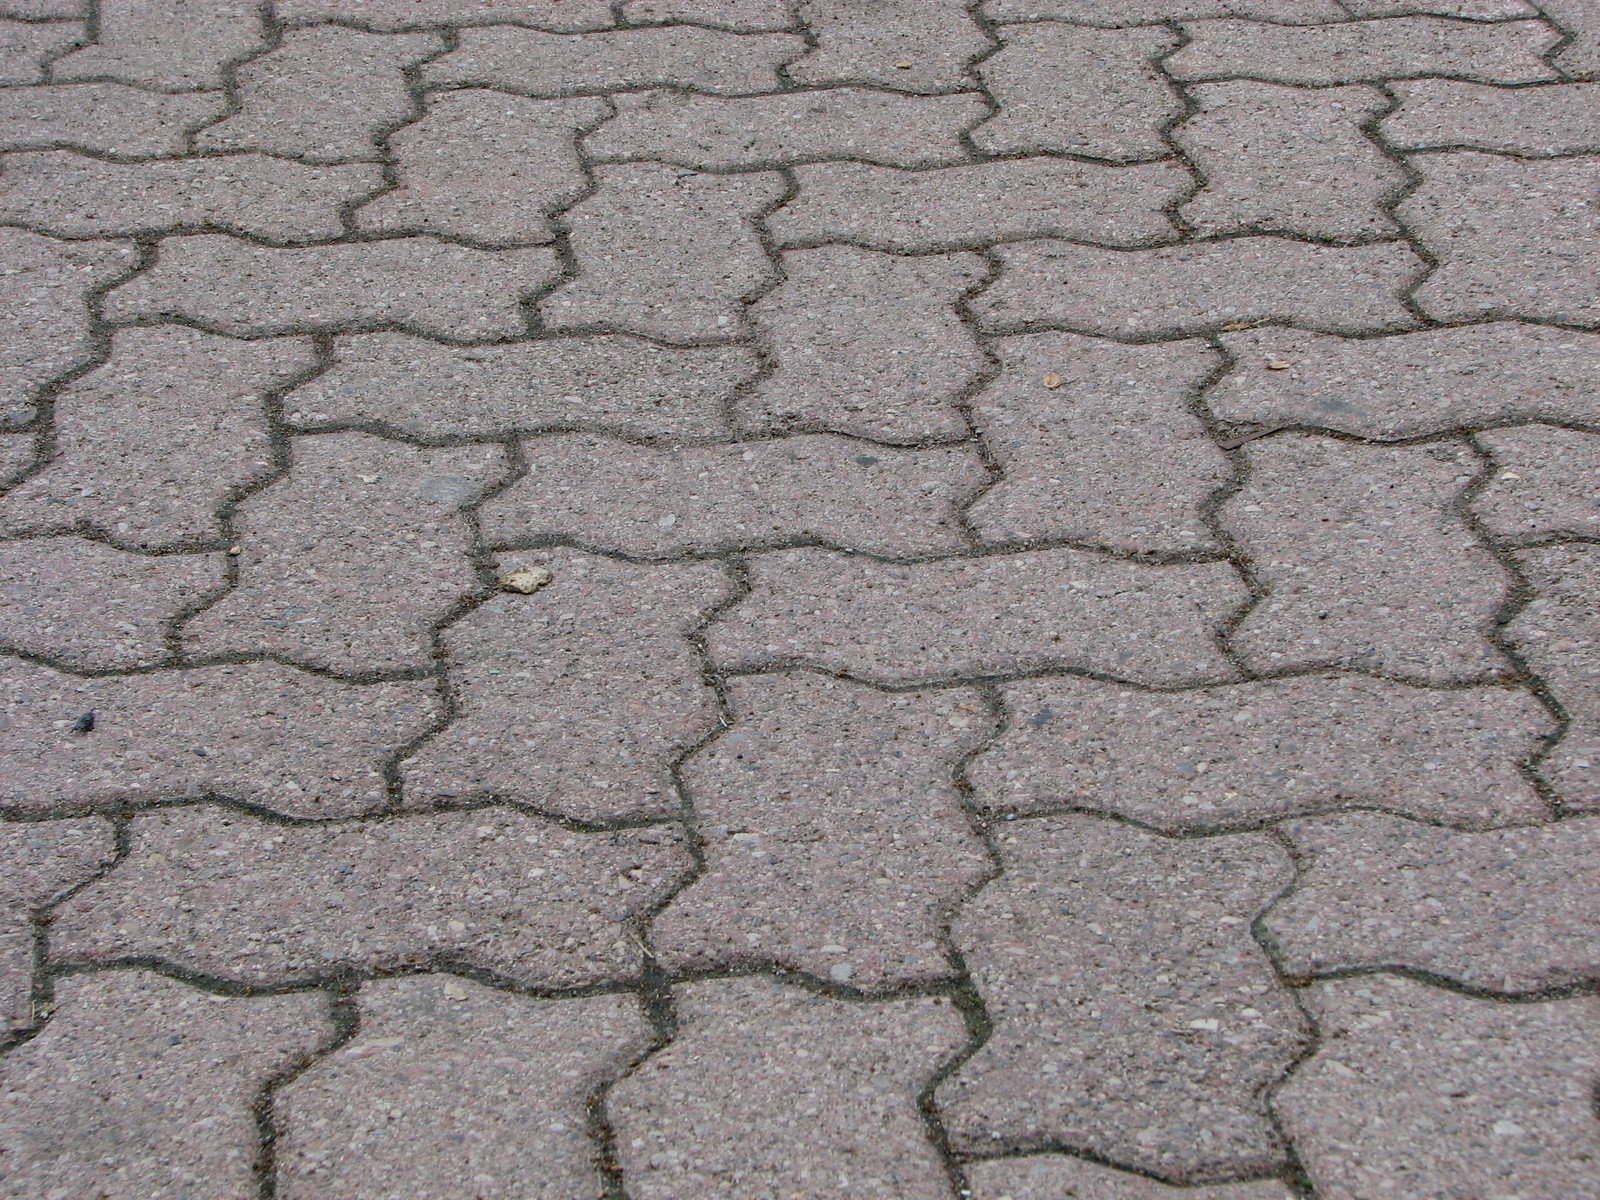 brick-path-1192645